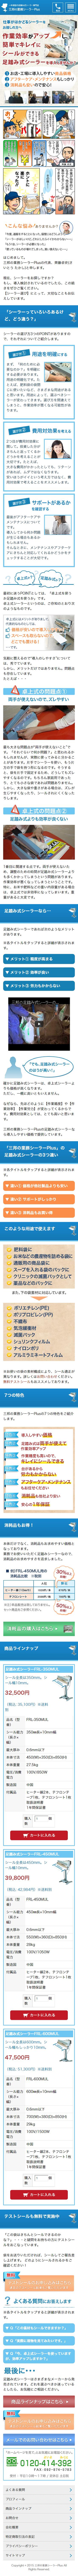 screencapture-mikuni-sealer-jp-sp-1468208452812